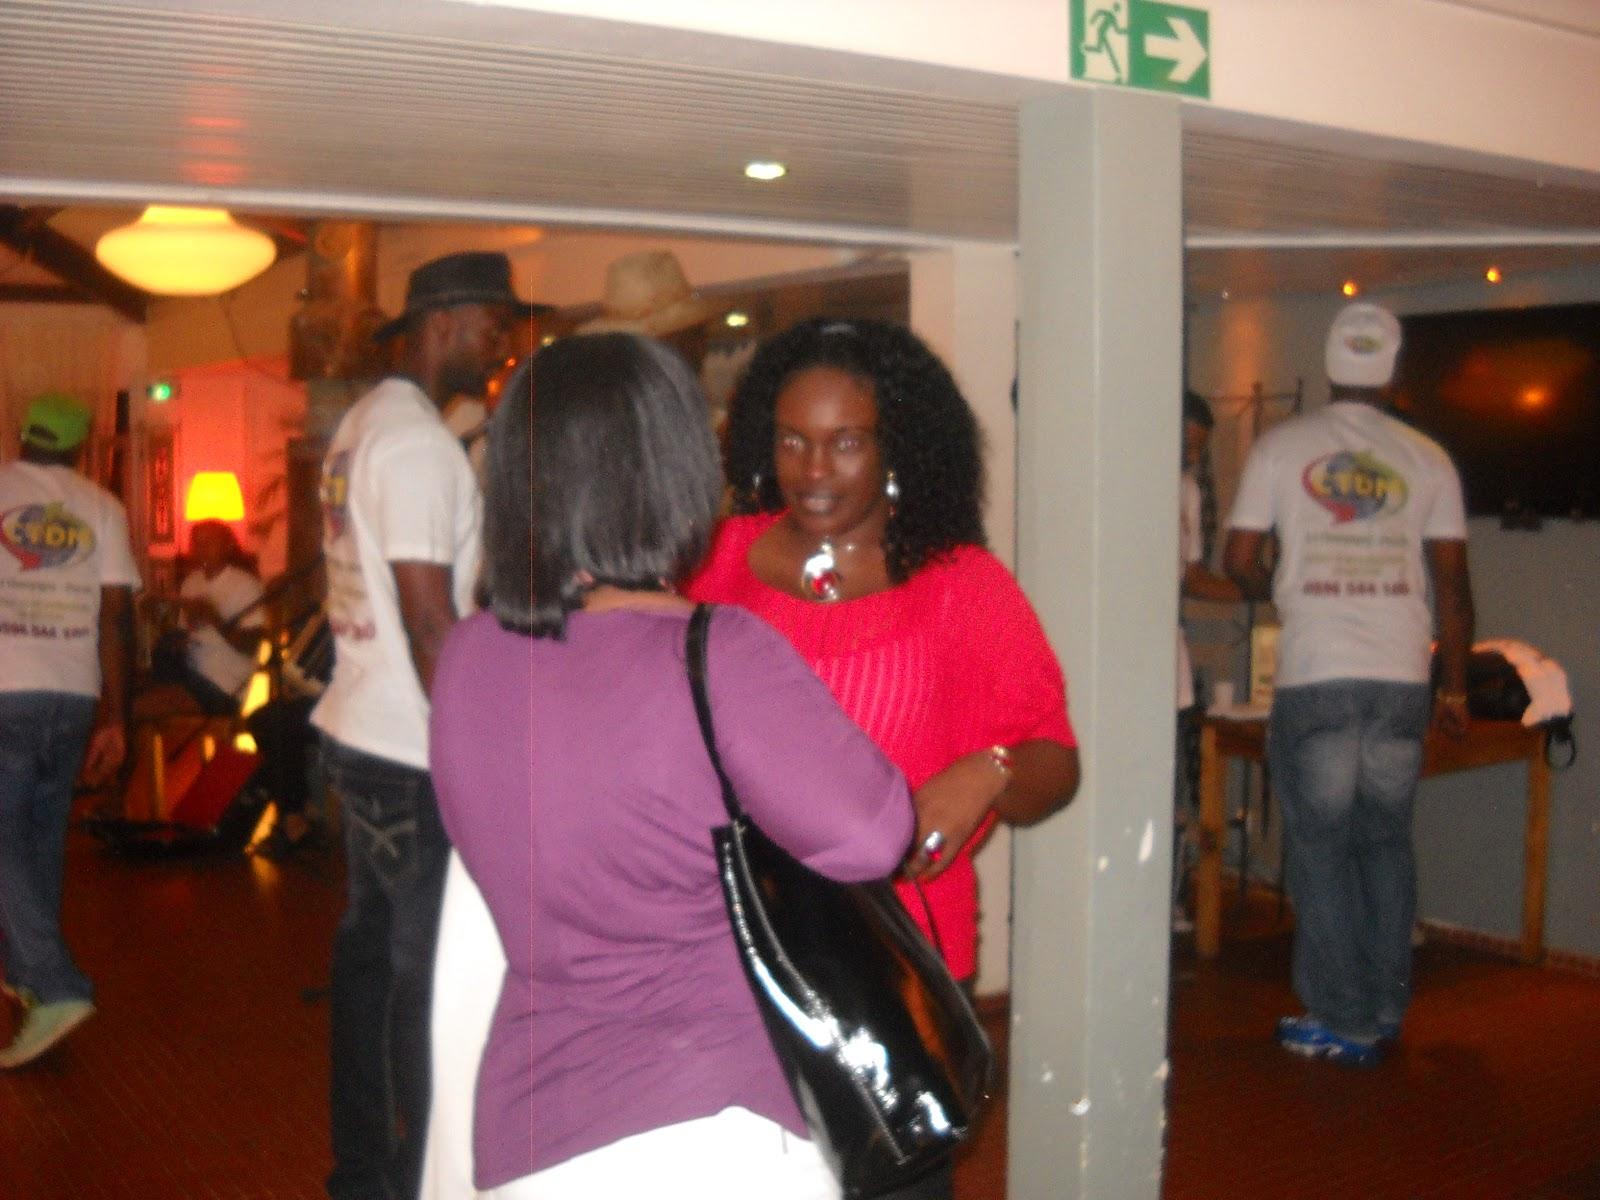 Scripta manent: Карибски дневници - 12: Коледно парти по ... - photo#50